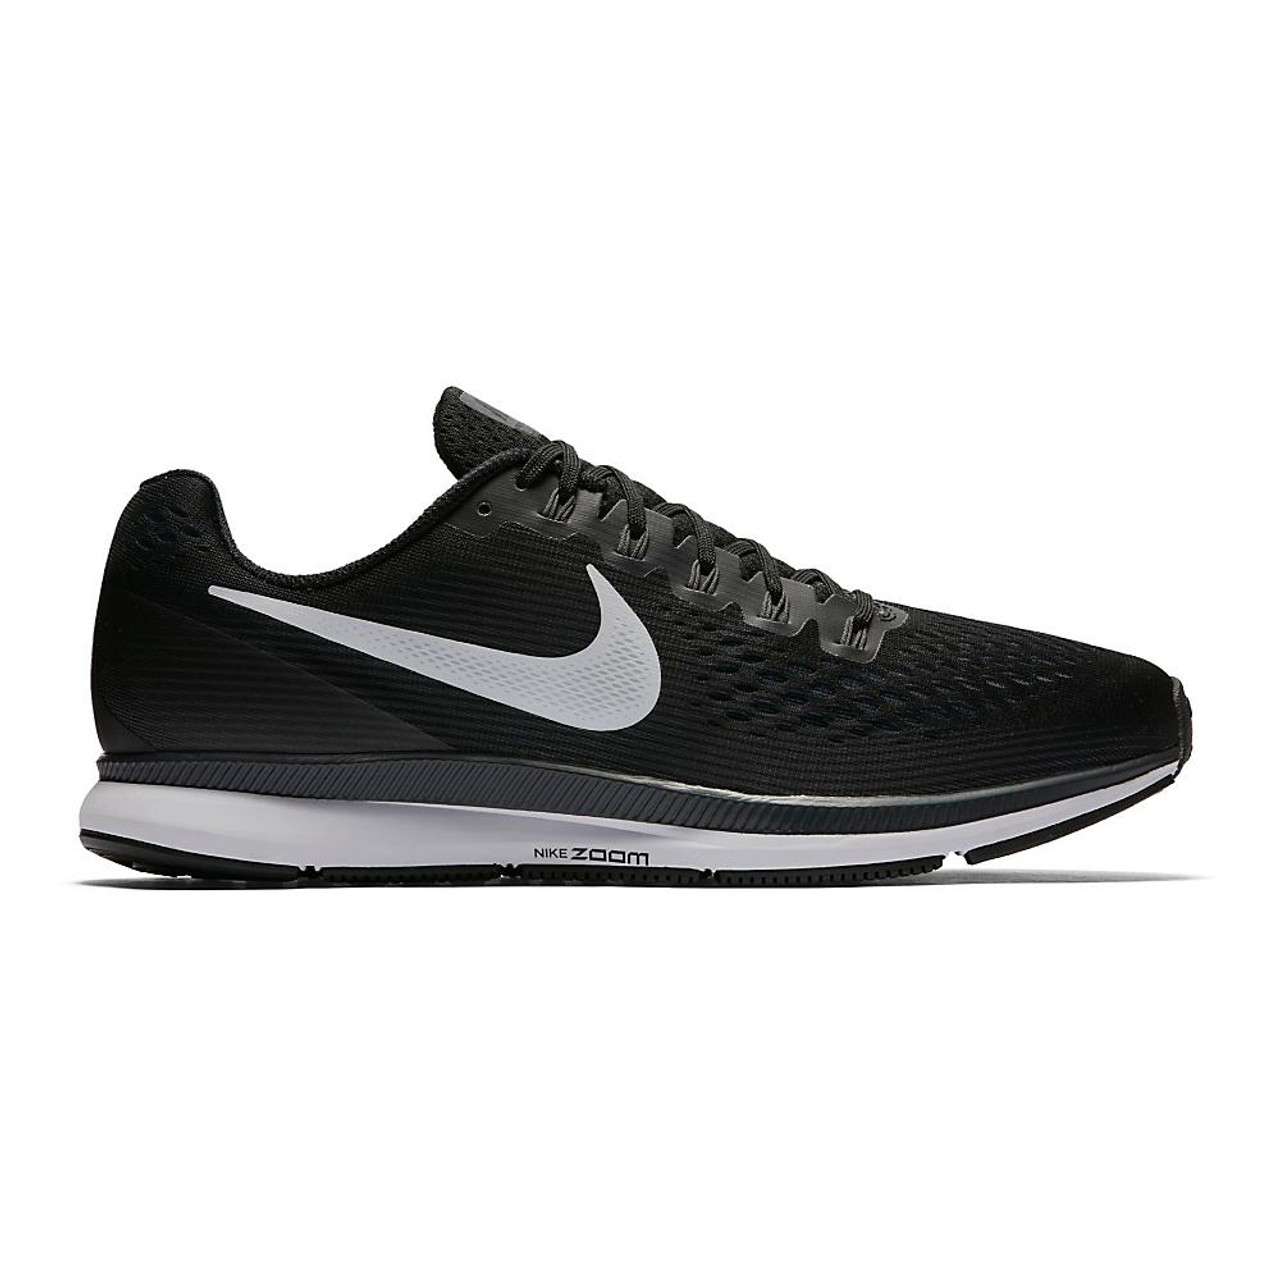 mizuno mens running shoes size 9 youtube latino